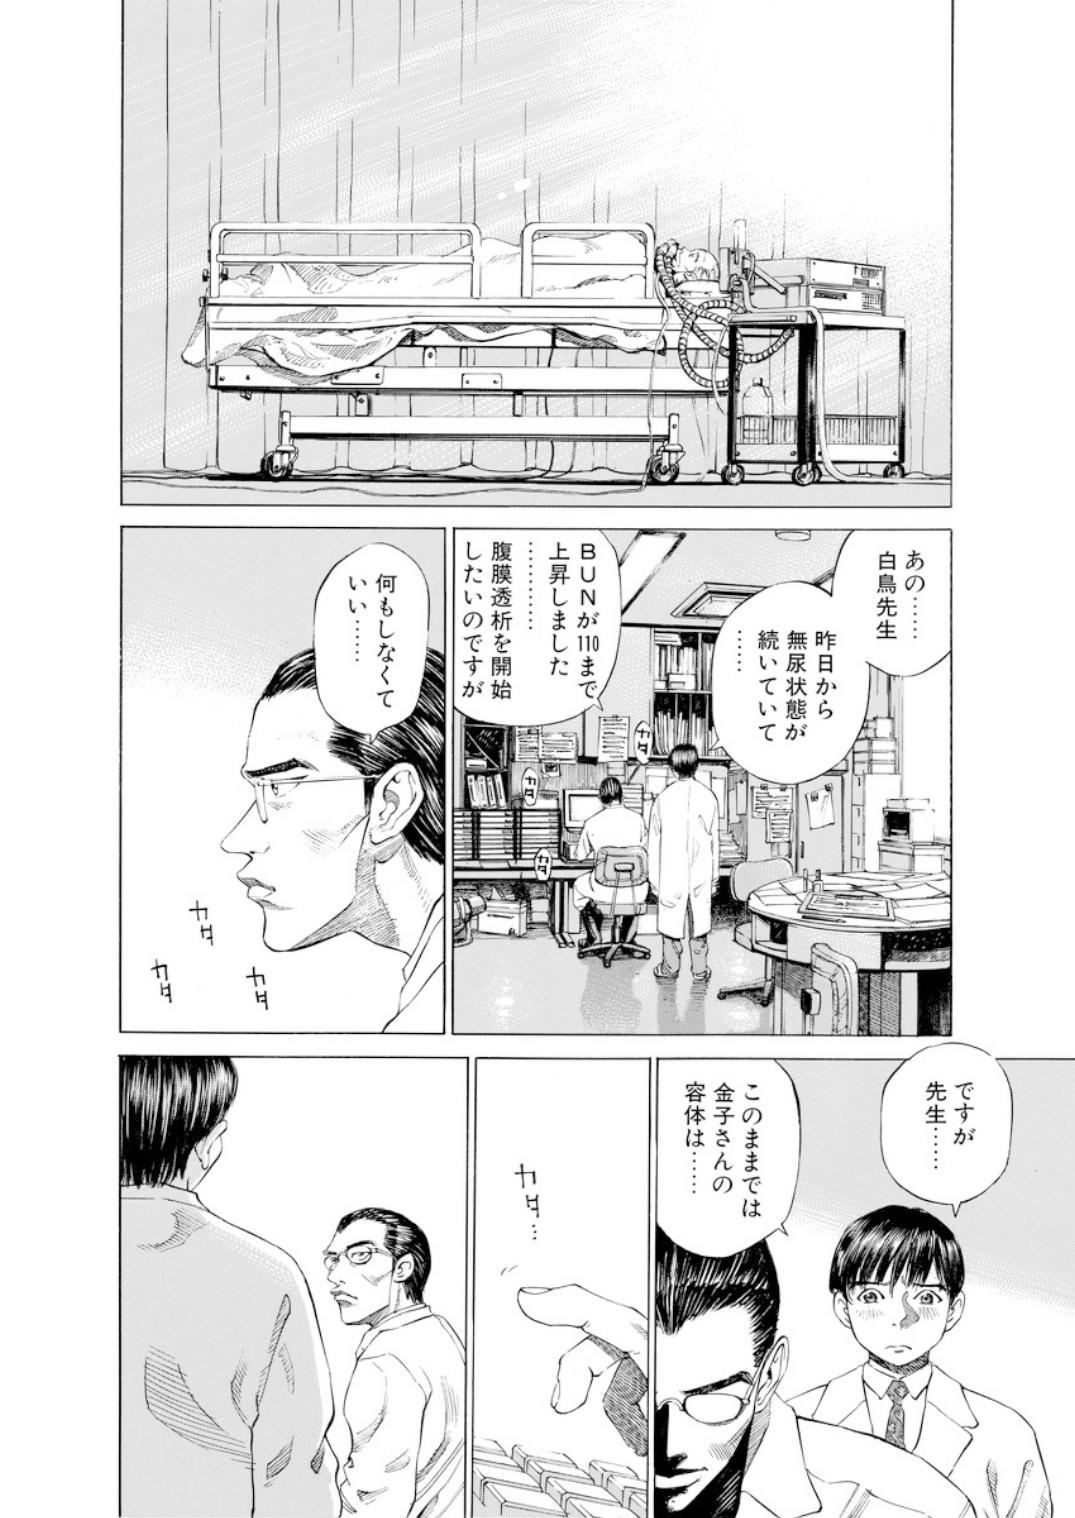 001bj_page-0098.jpg